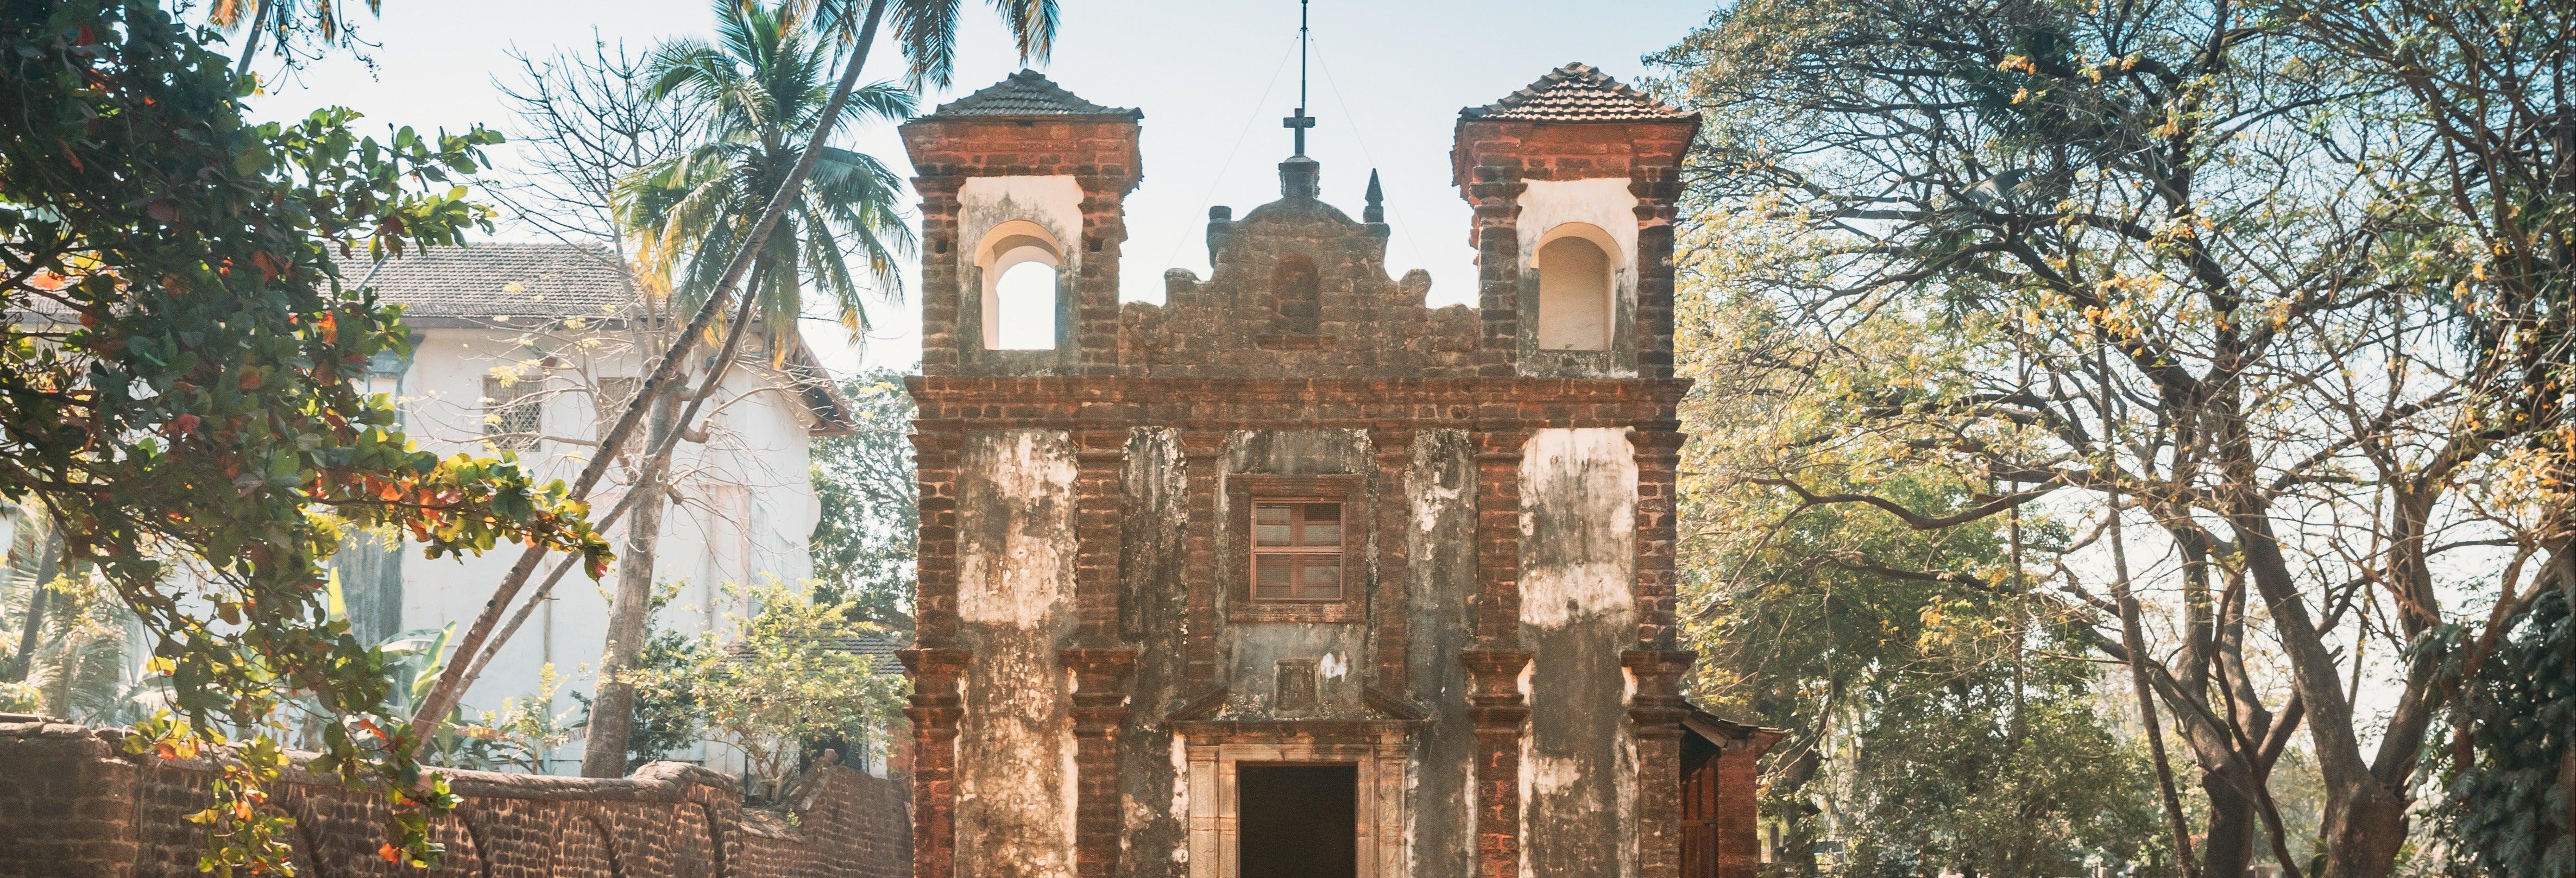 Tour por las iglesias de Goa